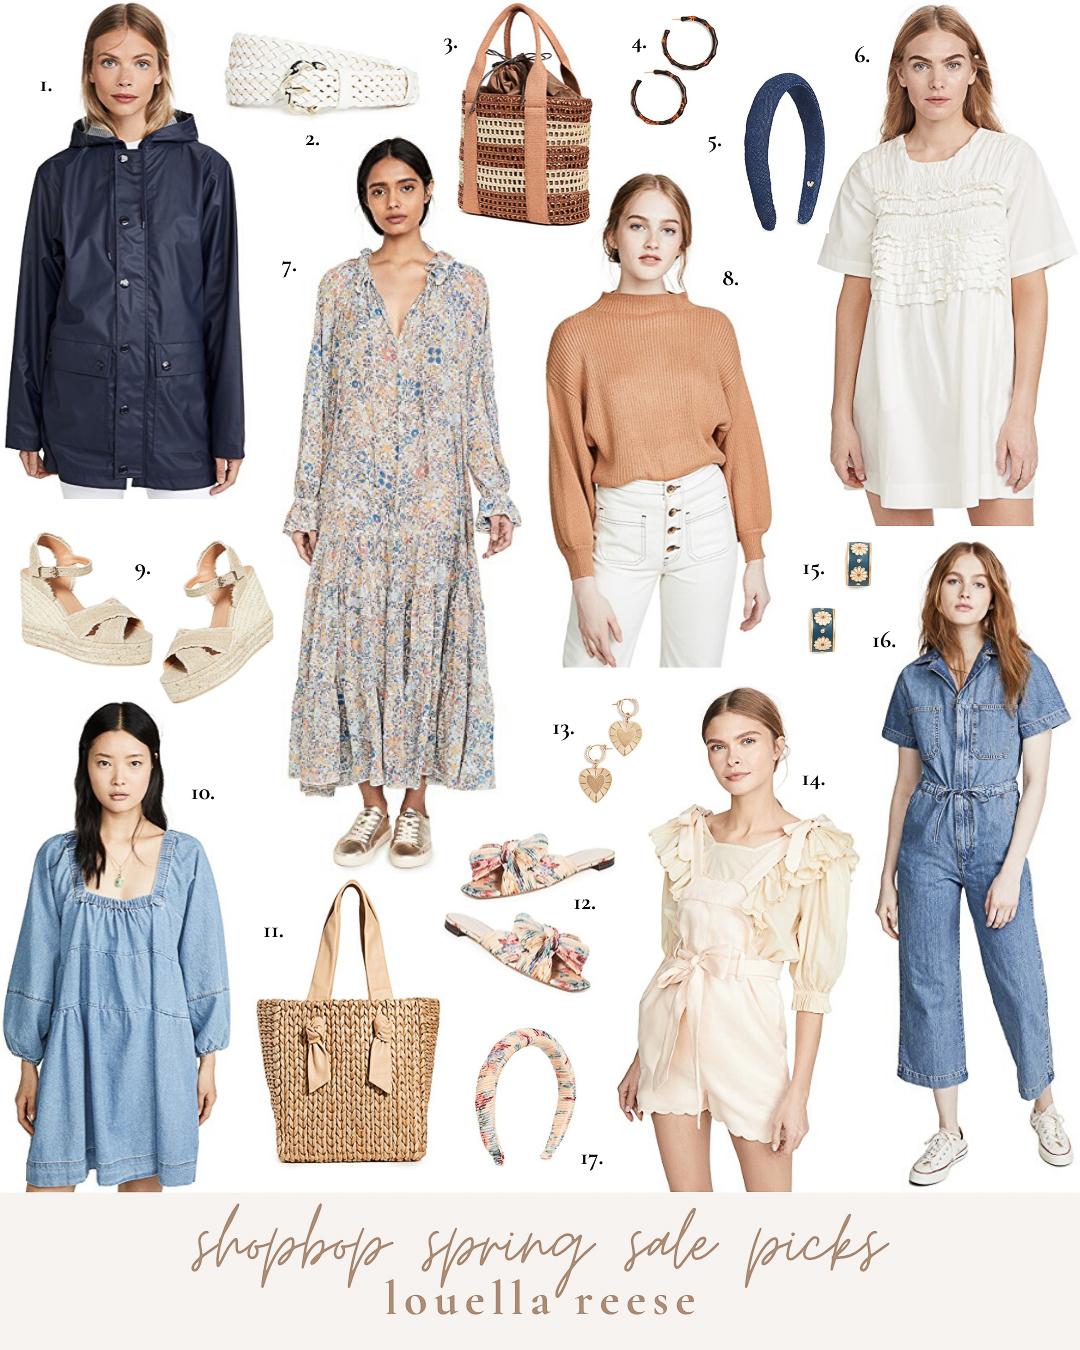 2020 Shopbop Spring Sale Picks | Louella Reese